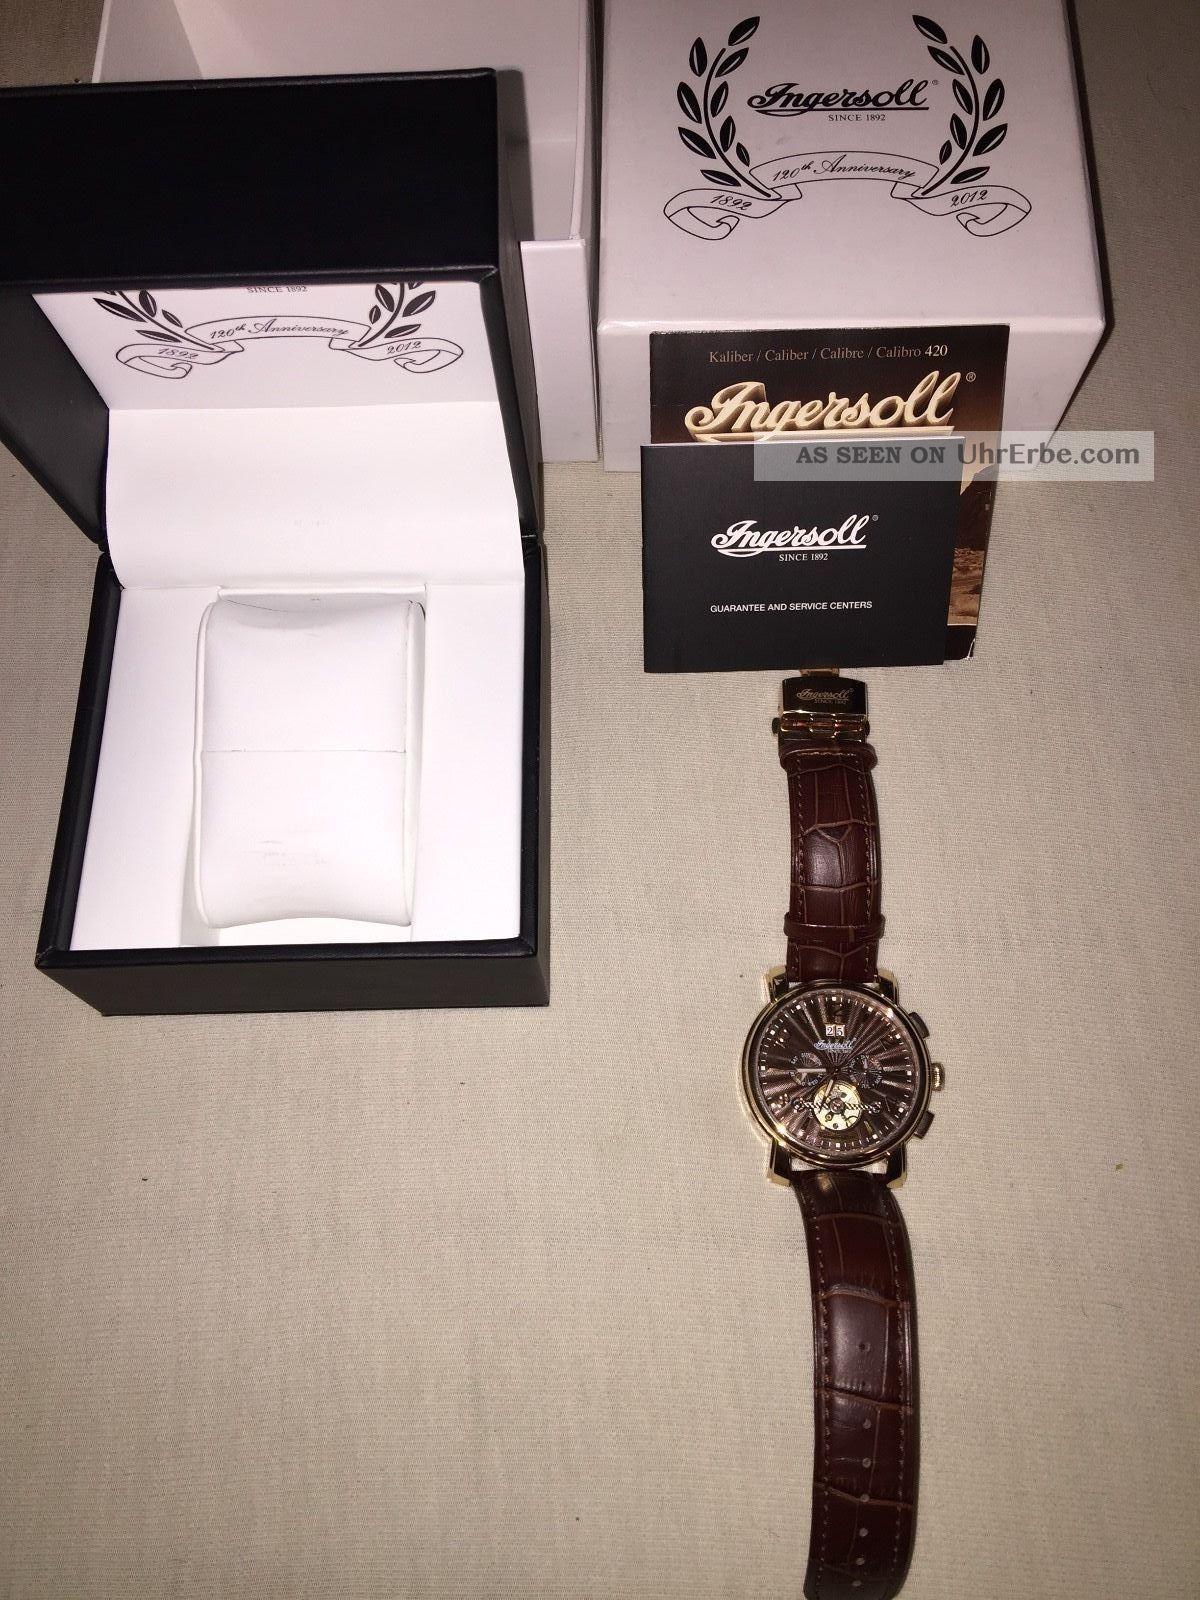 Ingersoll In1806rbr Santee Herrenarmbanduhr Automatik Armbanduhren Bild